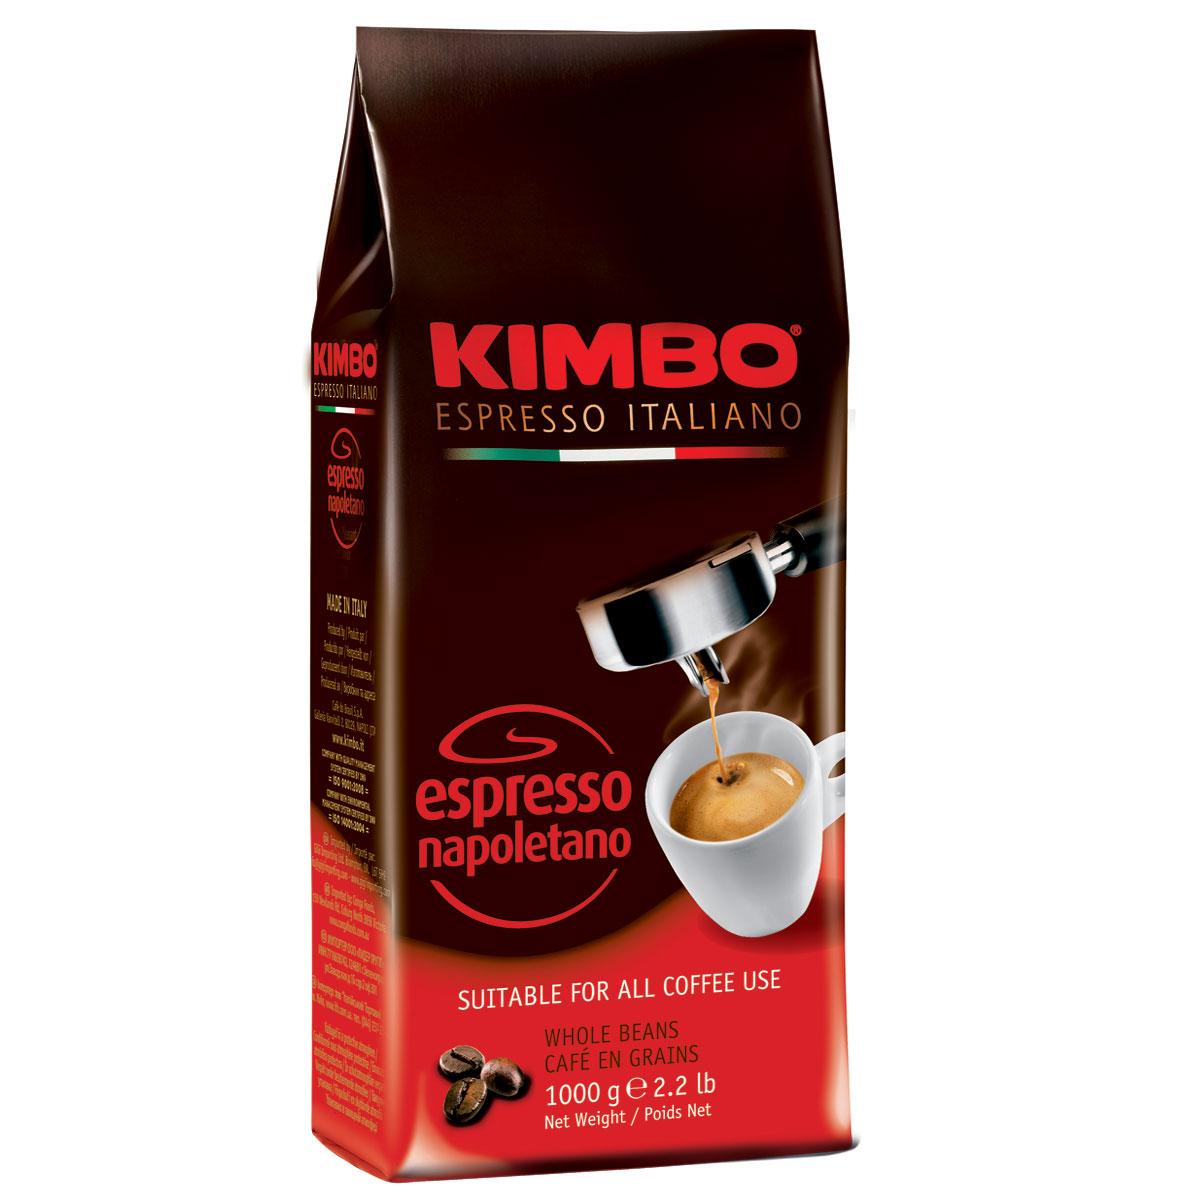 цена на Kimbo Espresso Napoletano кофе в зернах, 1 кг